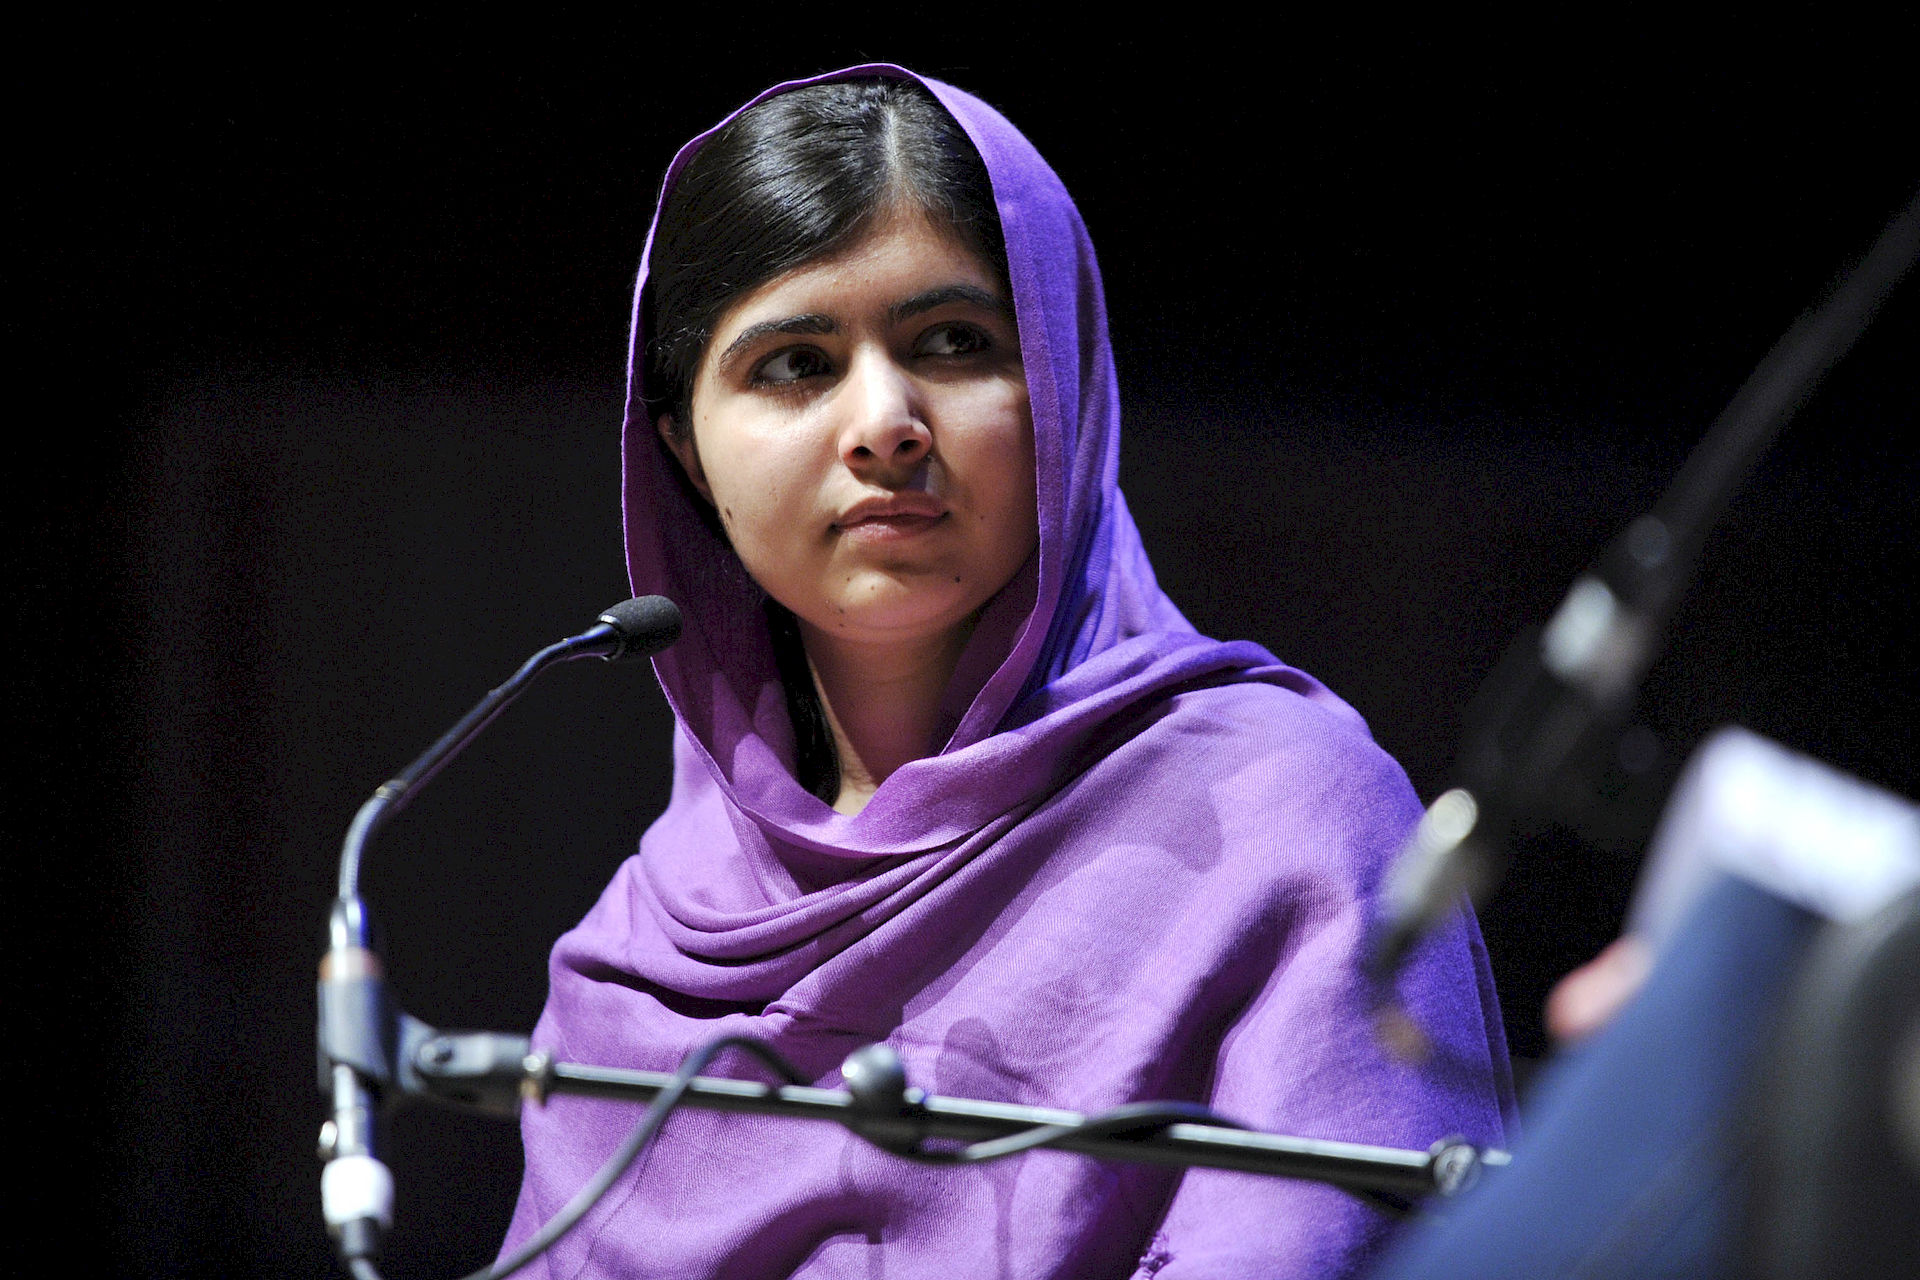 Photo of Malala Yousafzai: Pakistani children's education activist